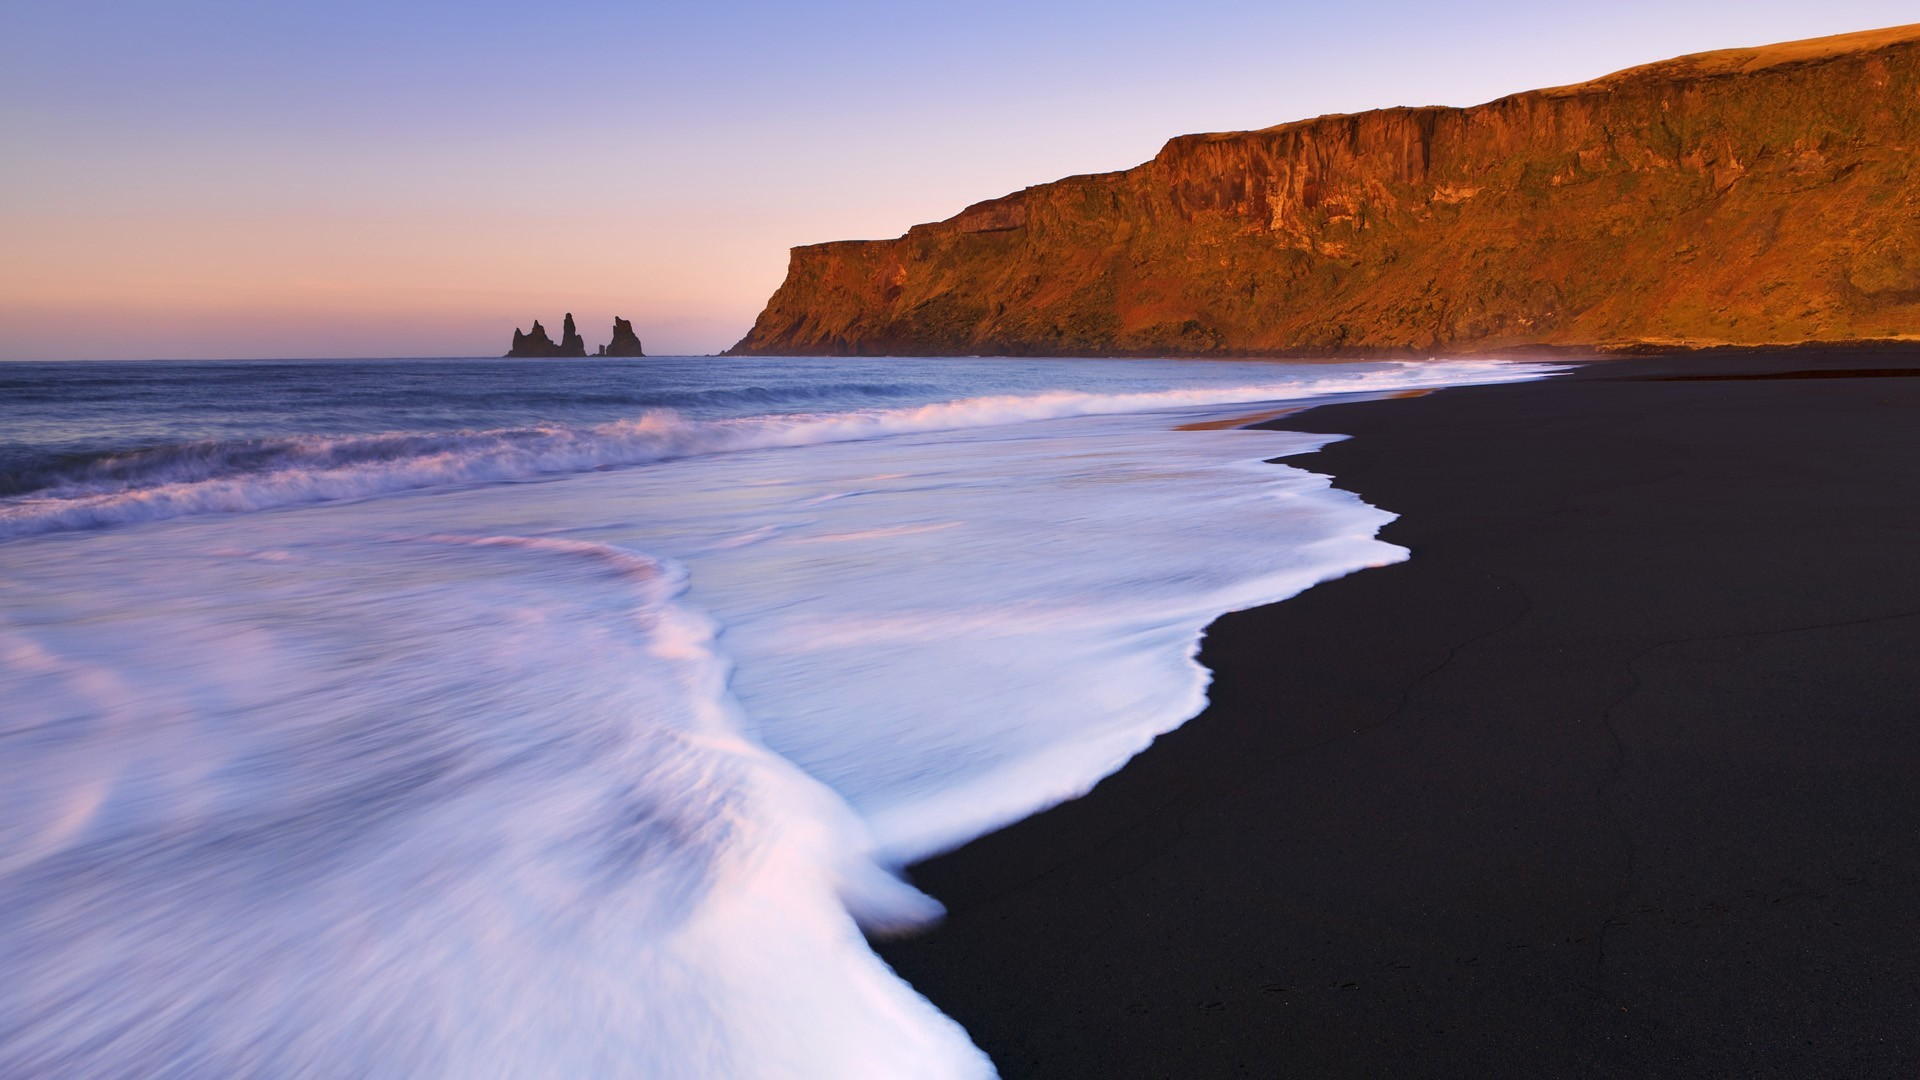 Iceland Beach Wallpaper